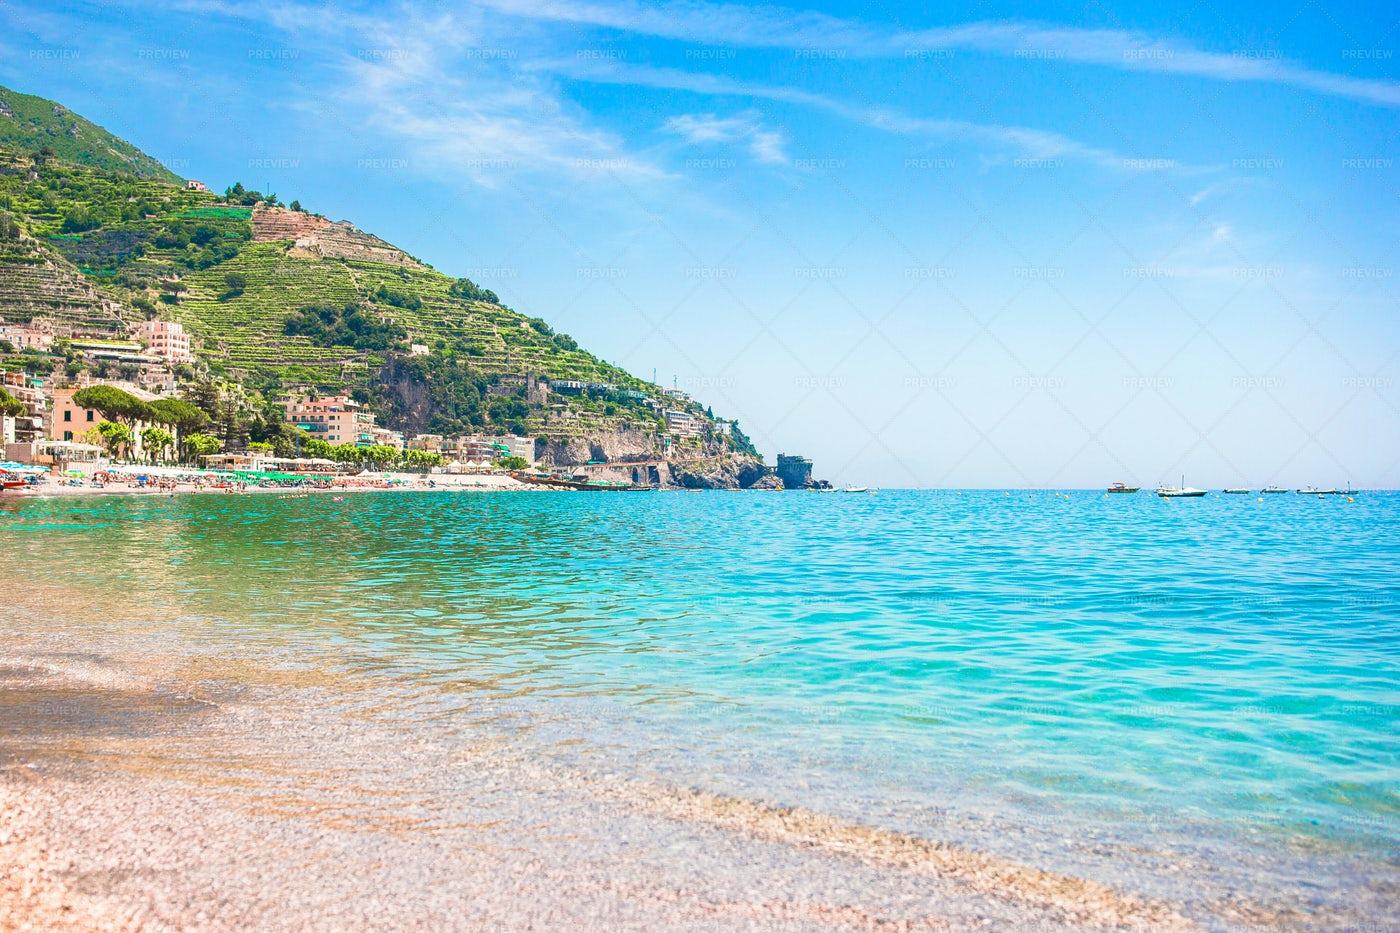 The Amalfi Coast: Stock Photos